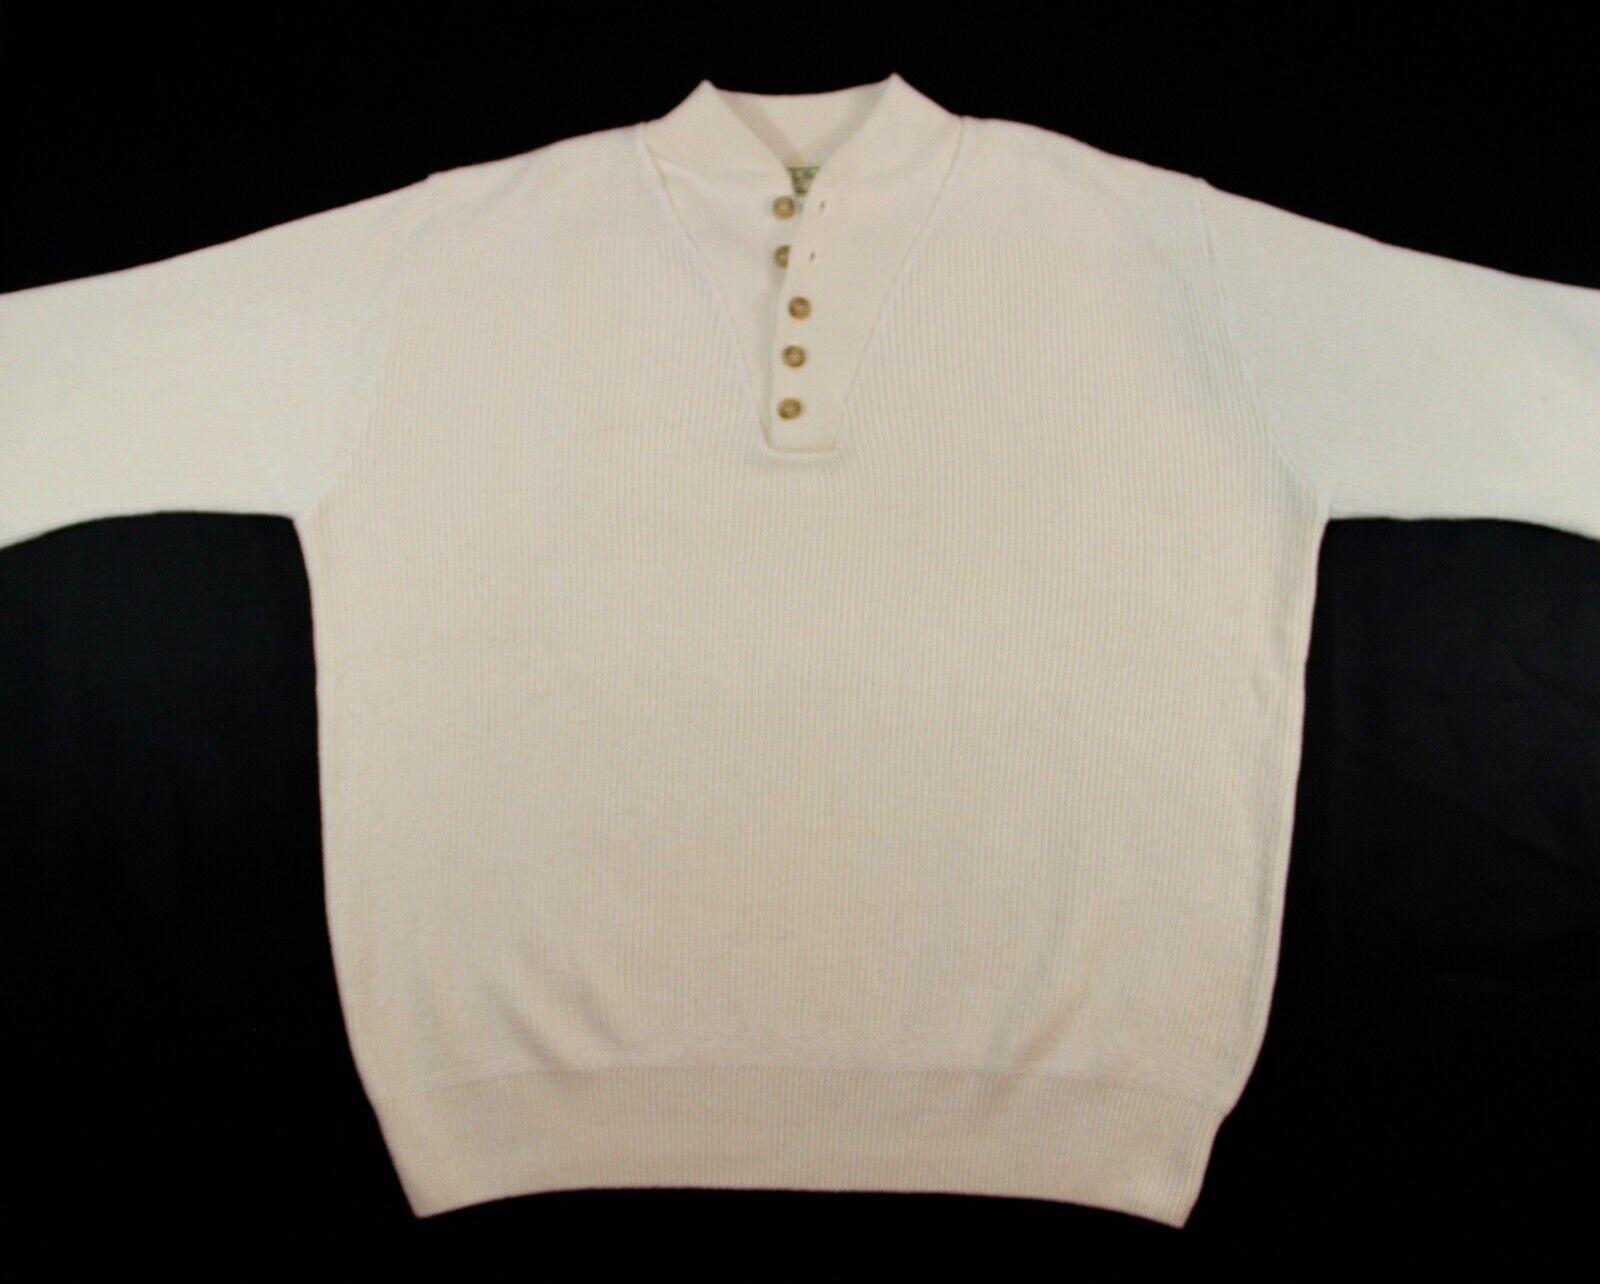 Vintage L.L. BEAN Cable Knit Off White Cotton Sweater - Men's XL Long - USA Made